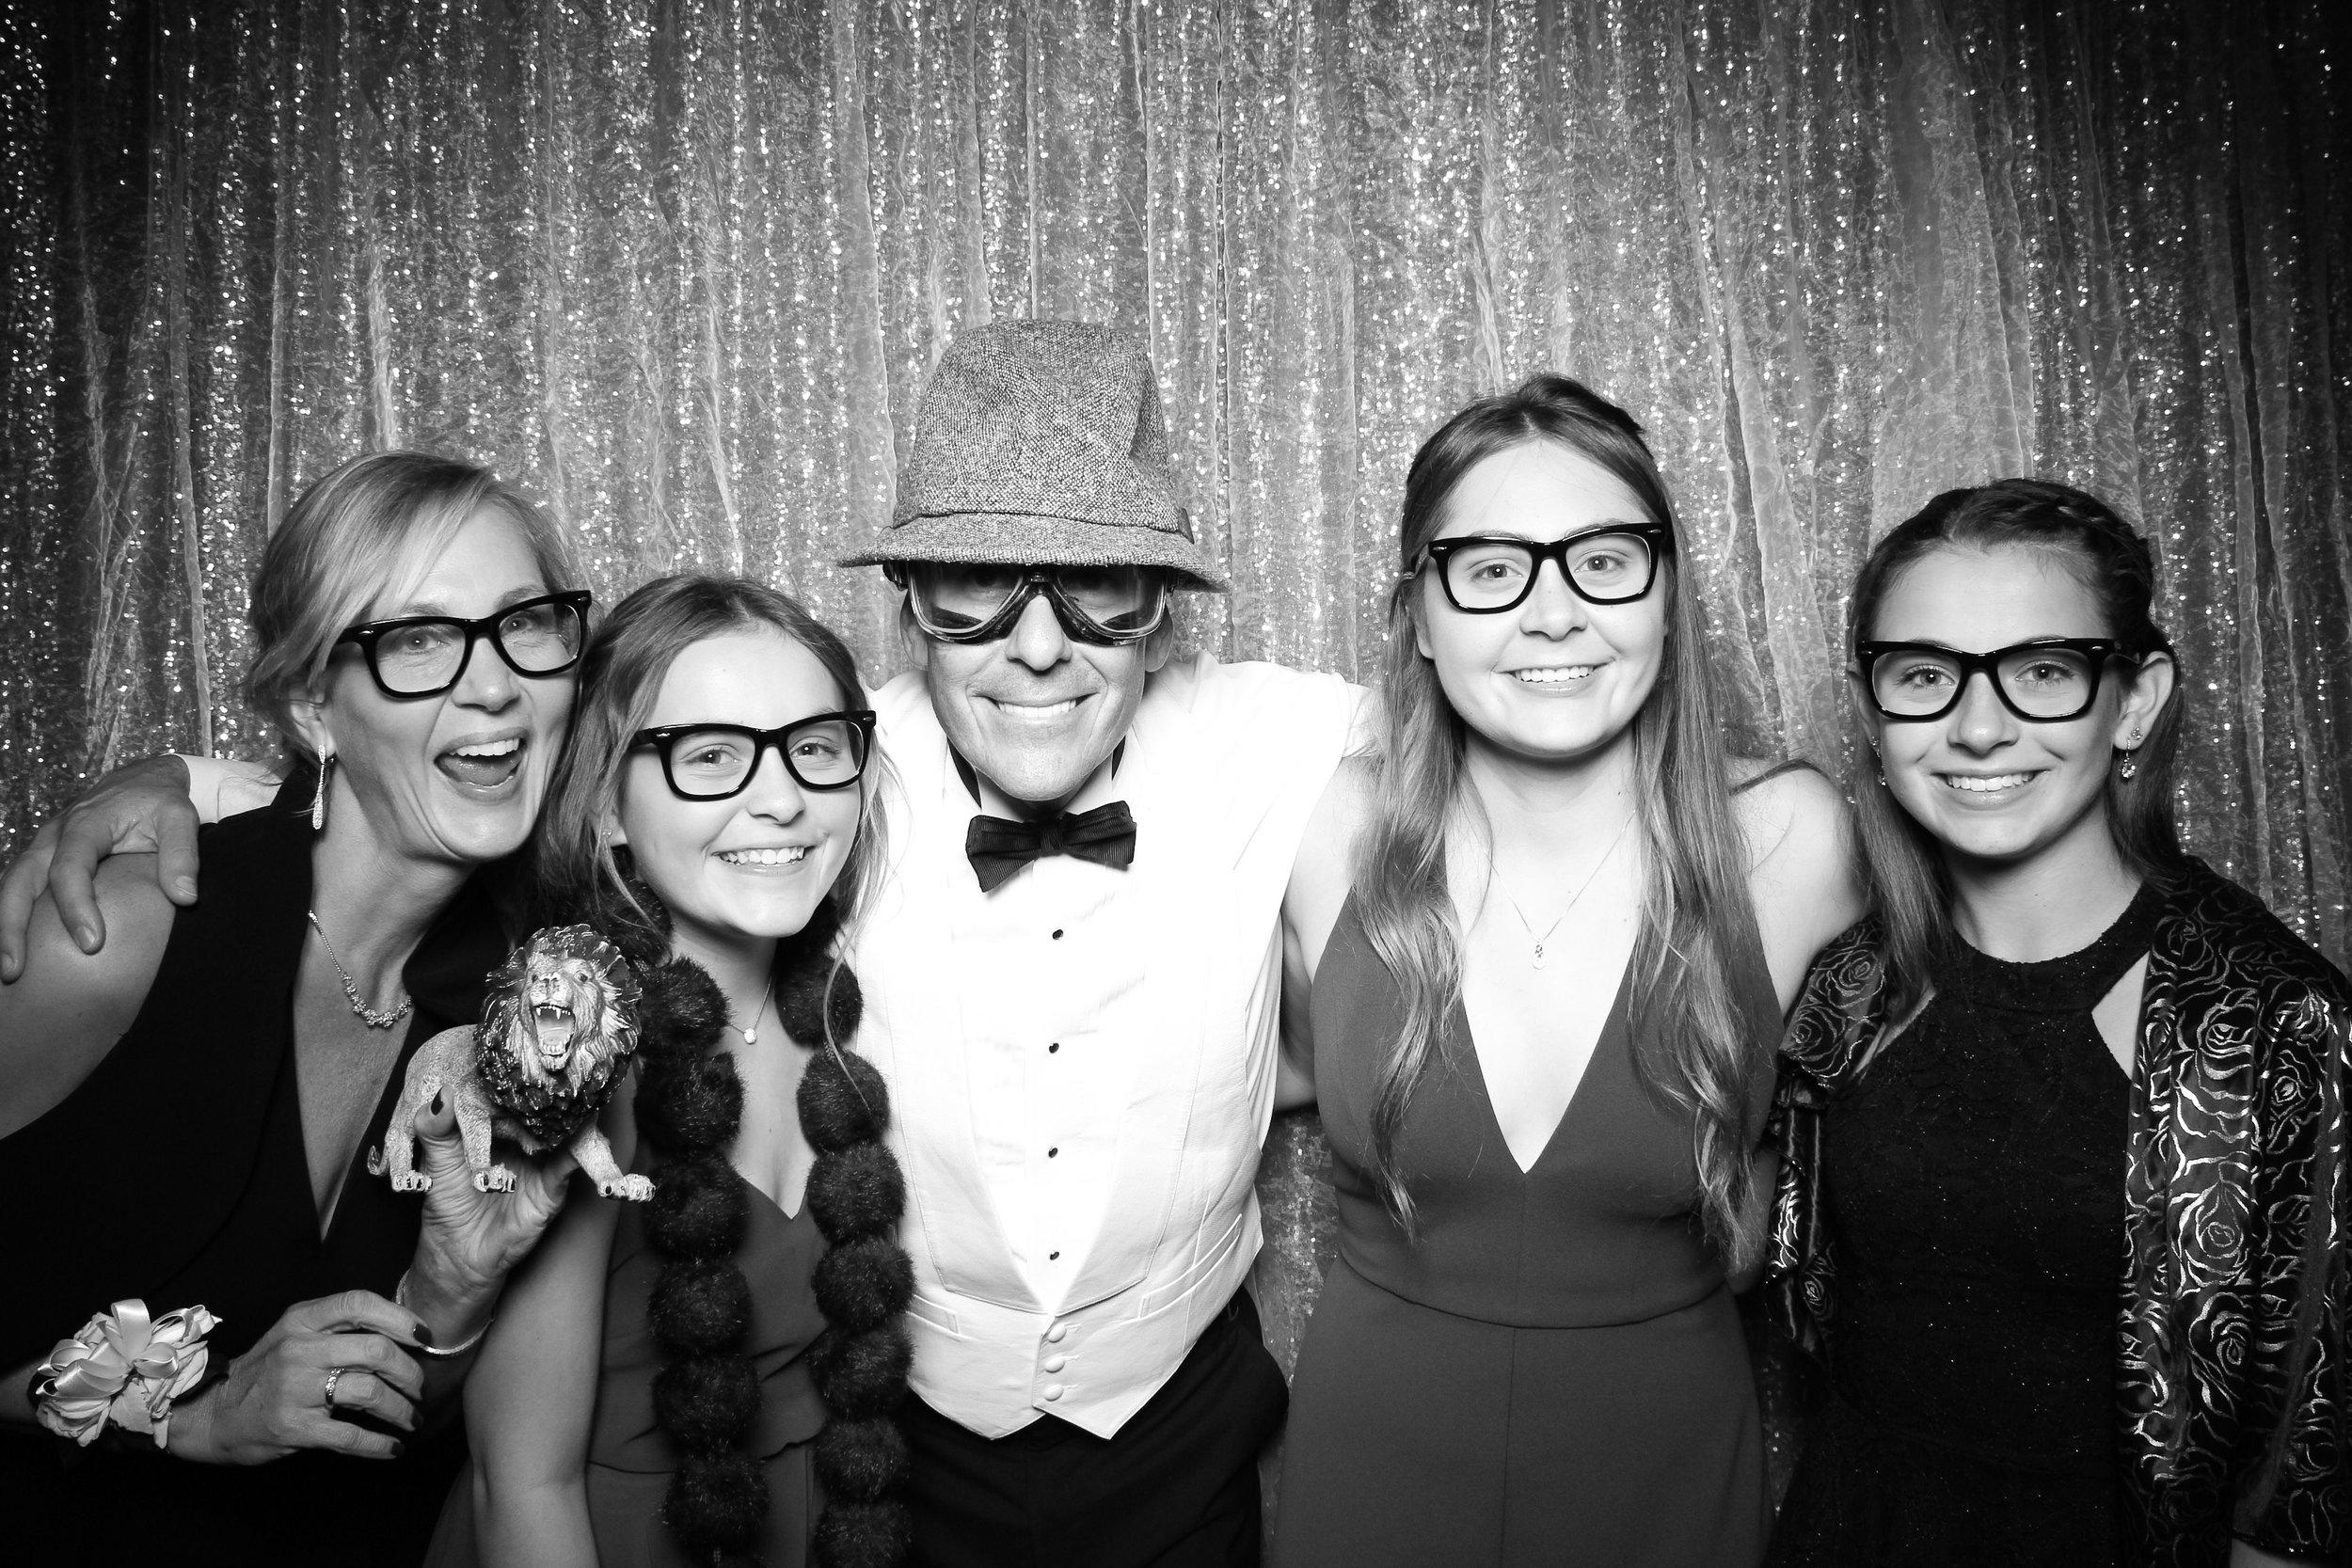 JW_Marriott_Burnham_Ballroom_Wedding_Photo_Booth_08.jpg